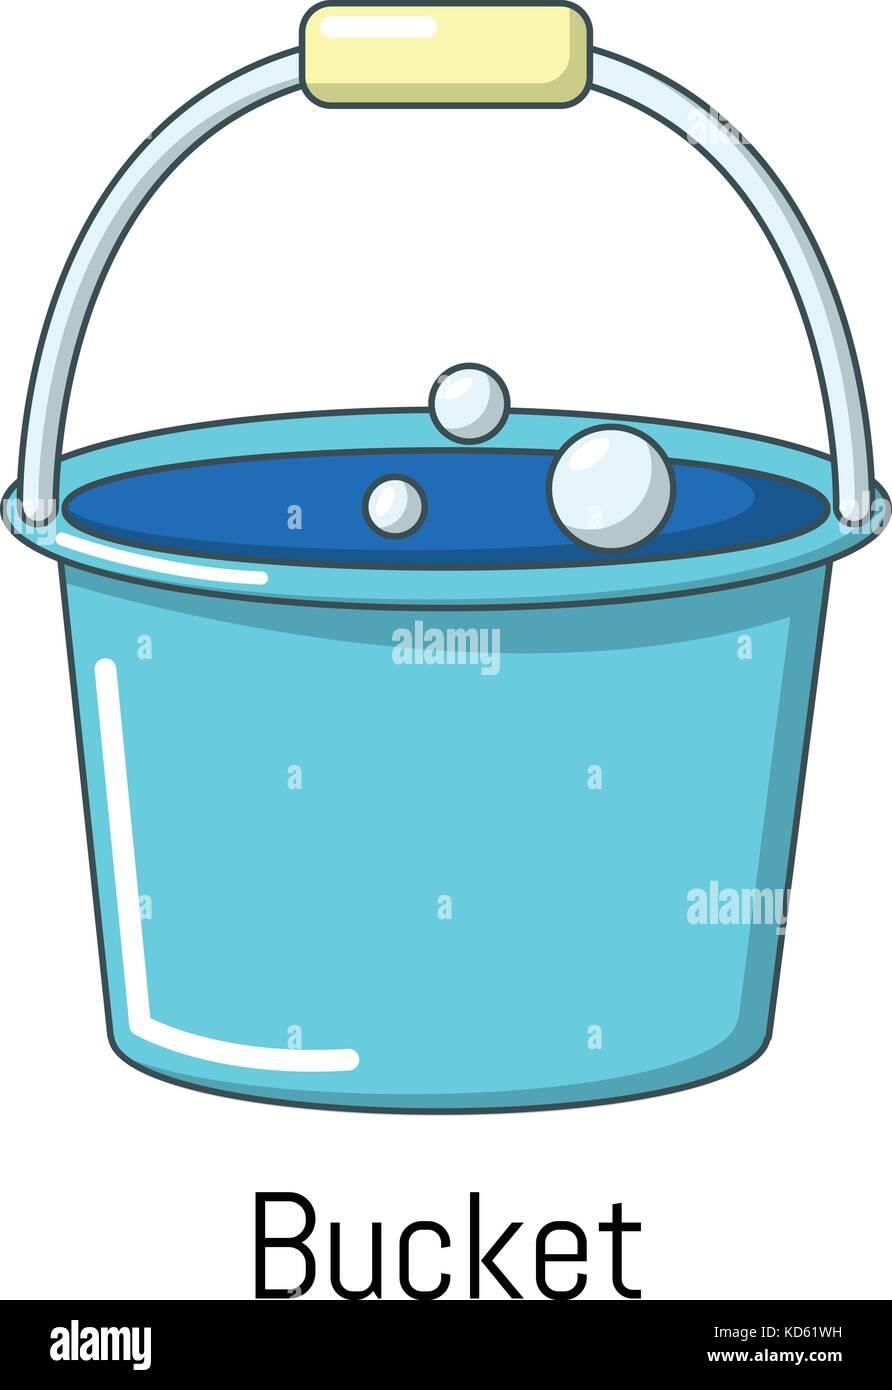 Bucket Shower Stock Photos & Bucket Shower Stock Images - Alamy